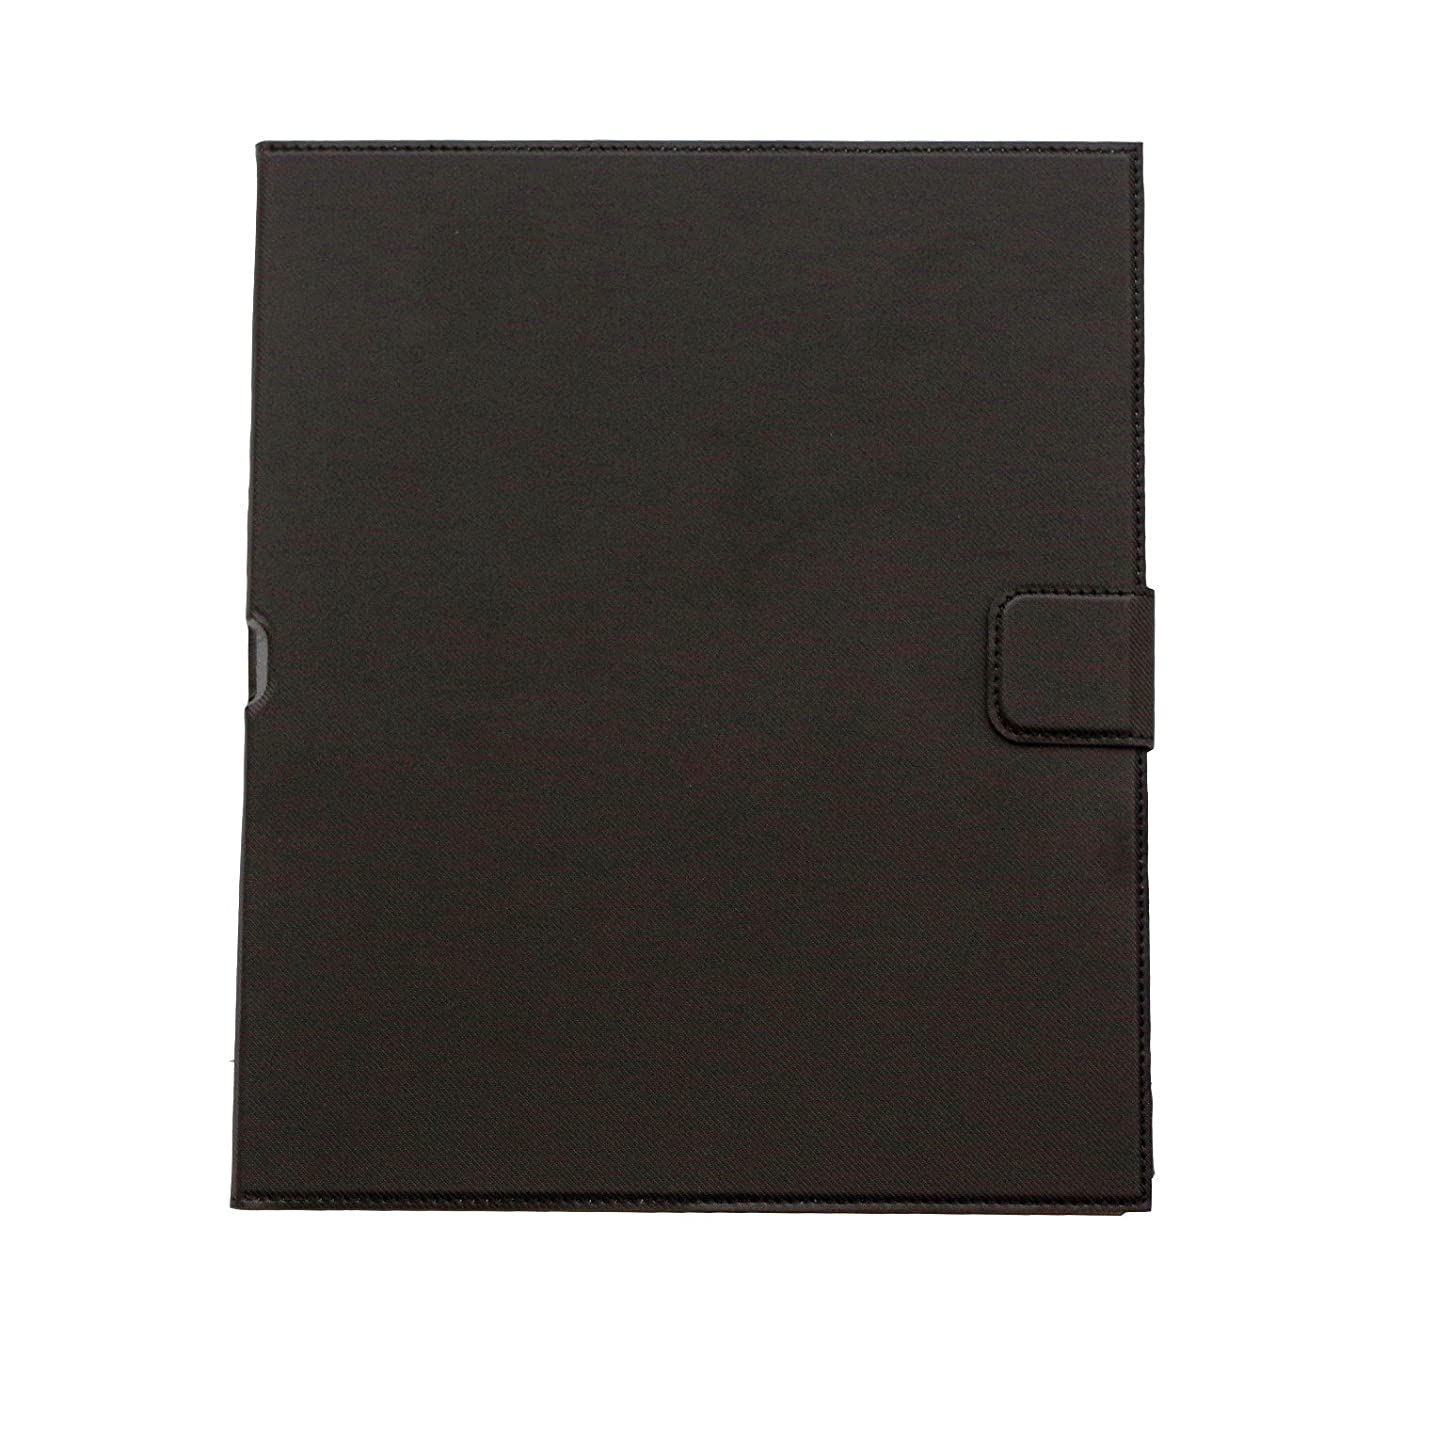 Premium Flip Case Portfolio Case for Boogie Board Blackboard 14-inch Writing Tablet Liquid Crystal Paper 8.5x11